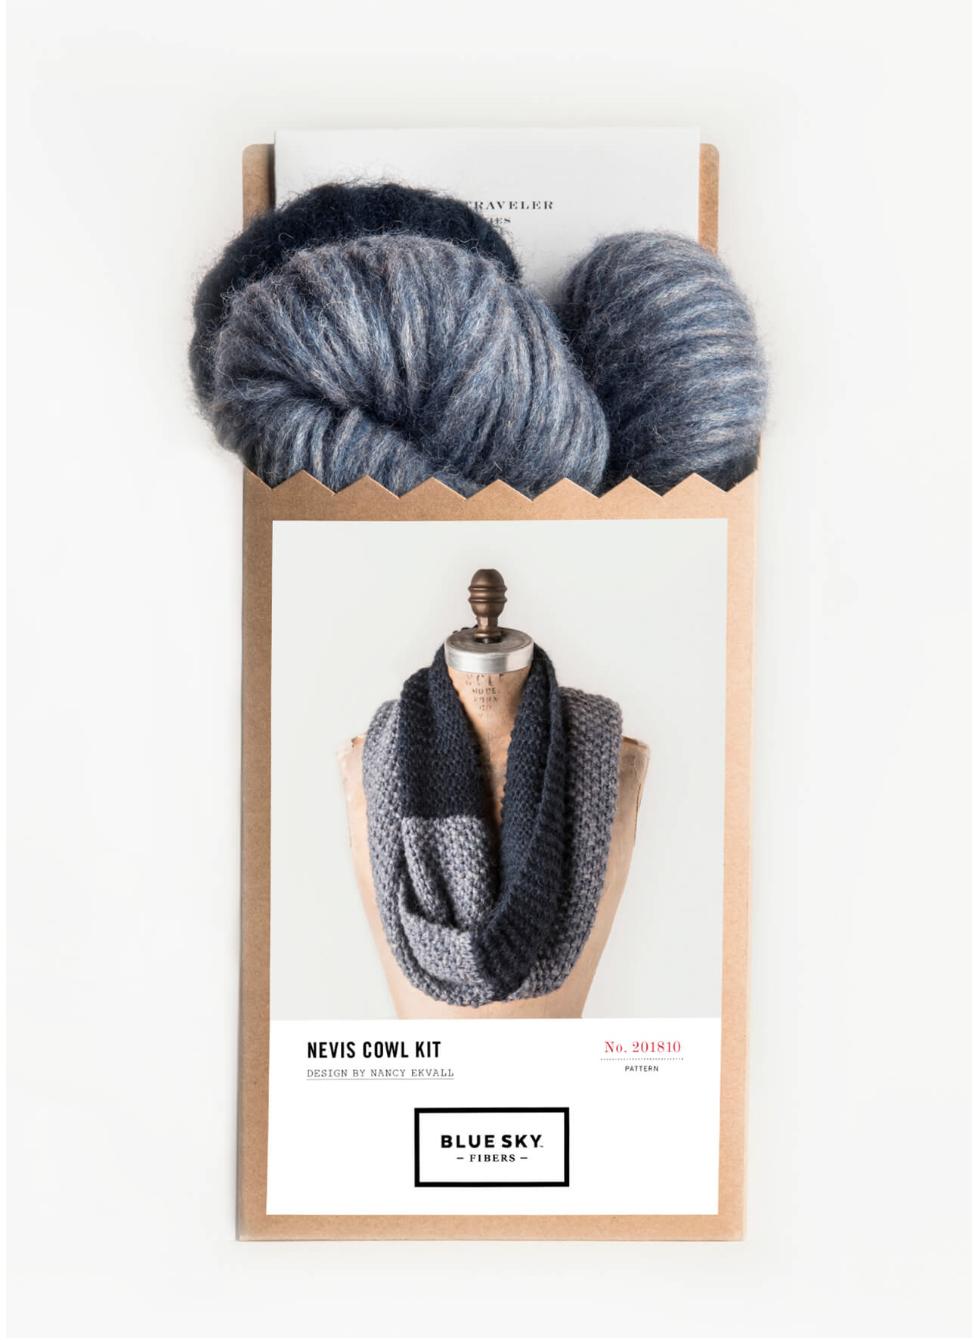 Nevis Cowl Kit by Blue Sky Fibers